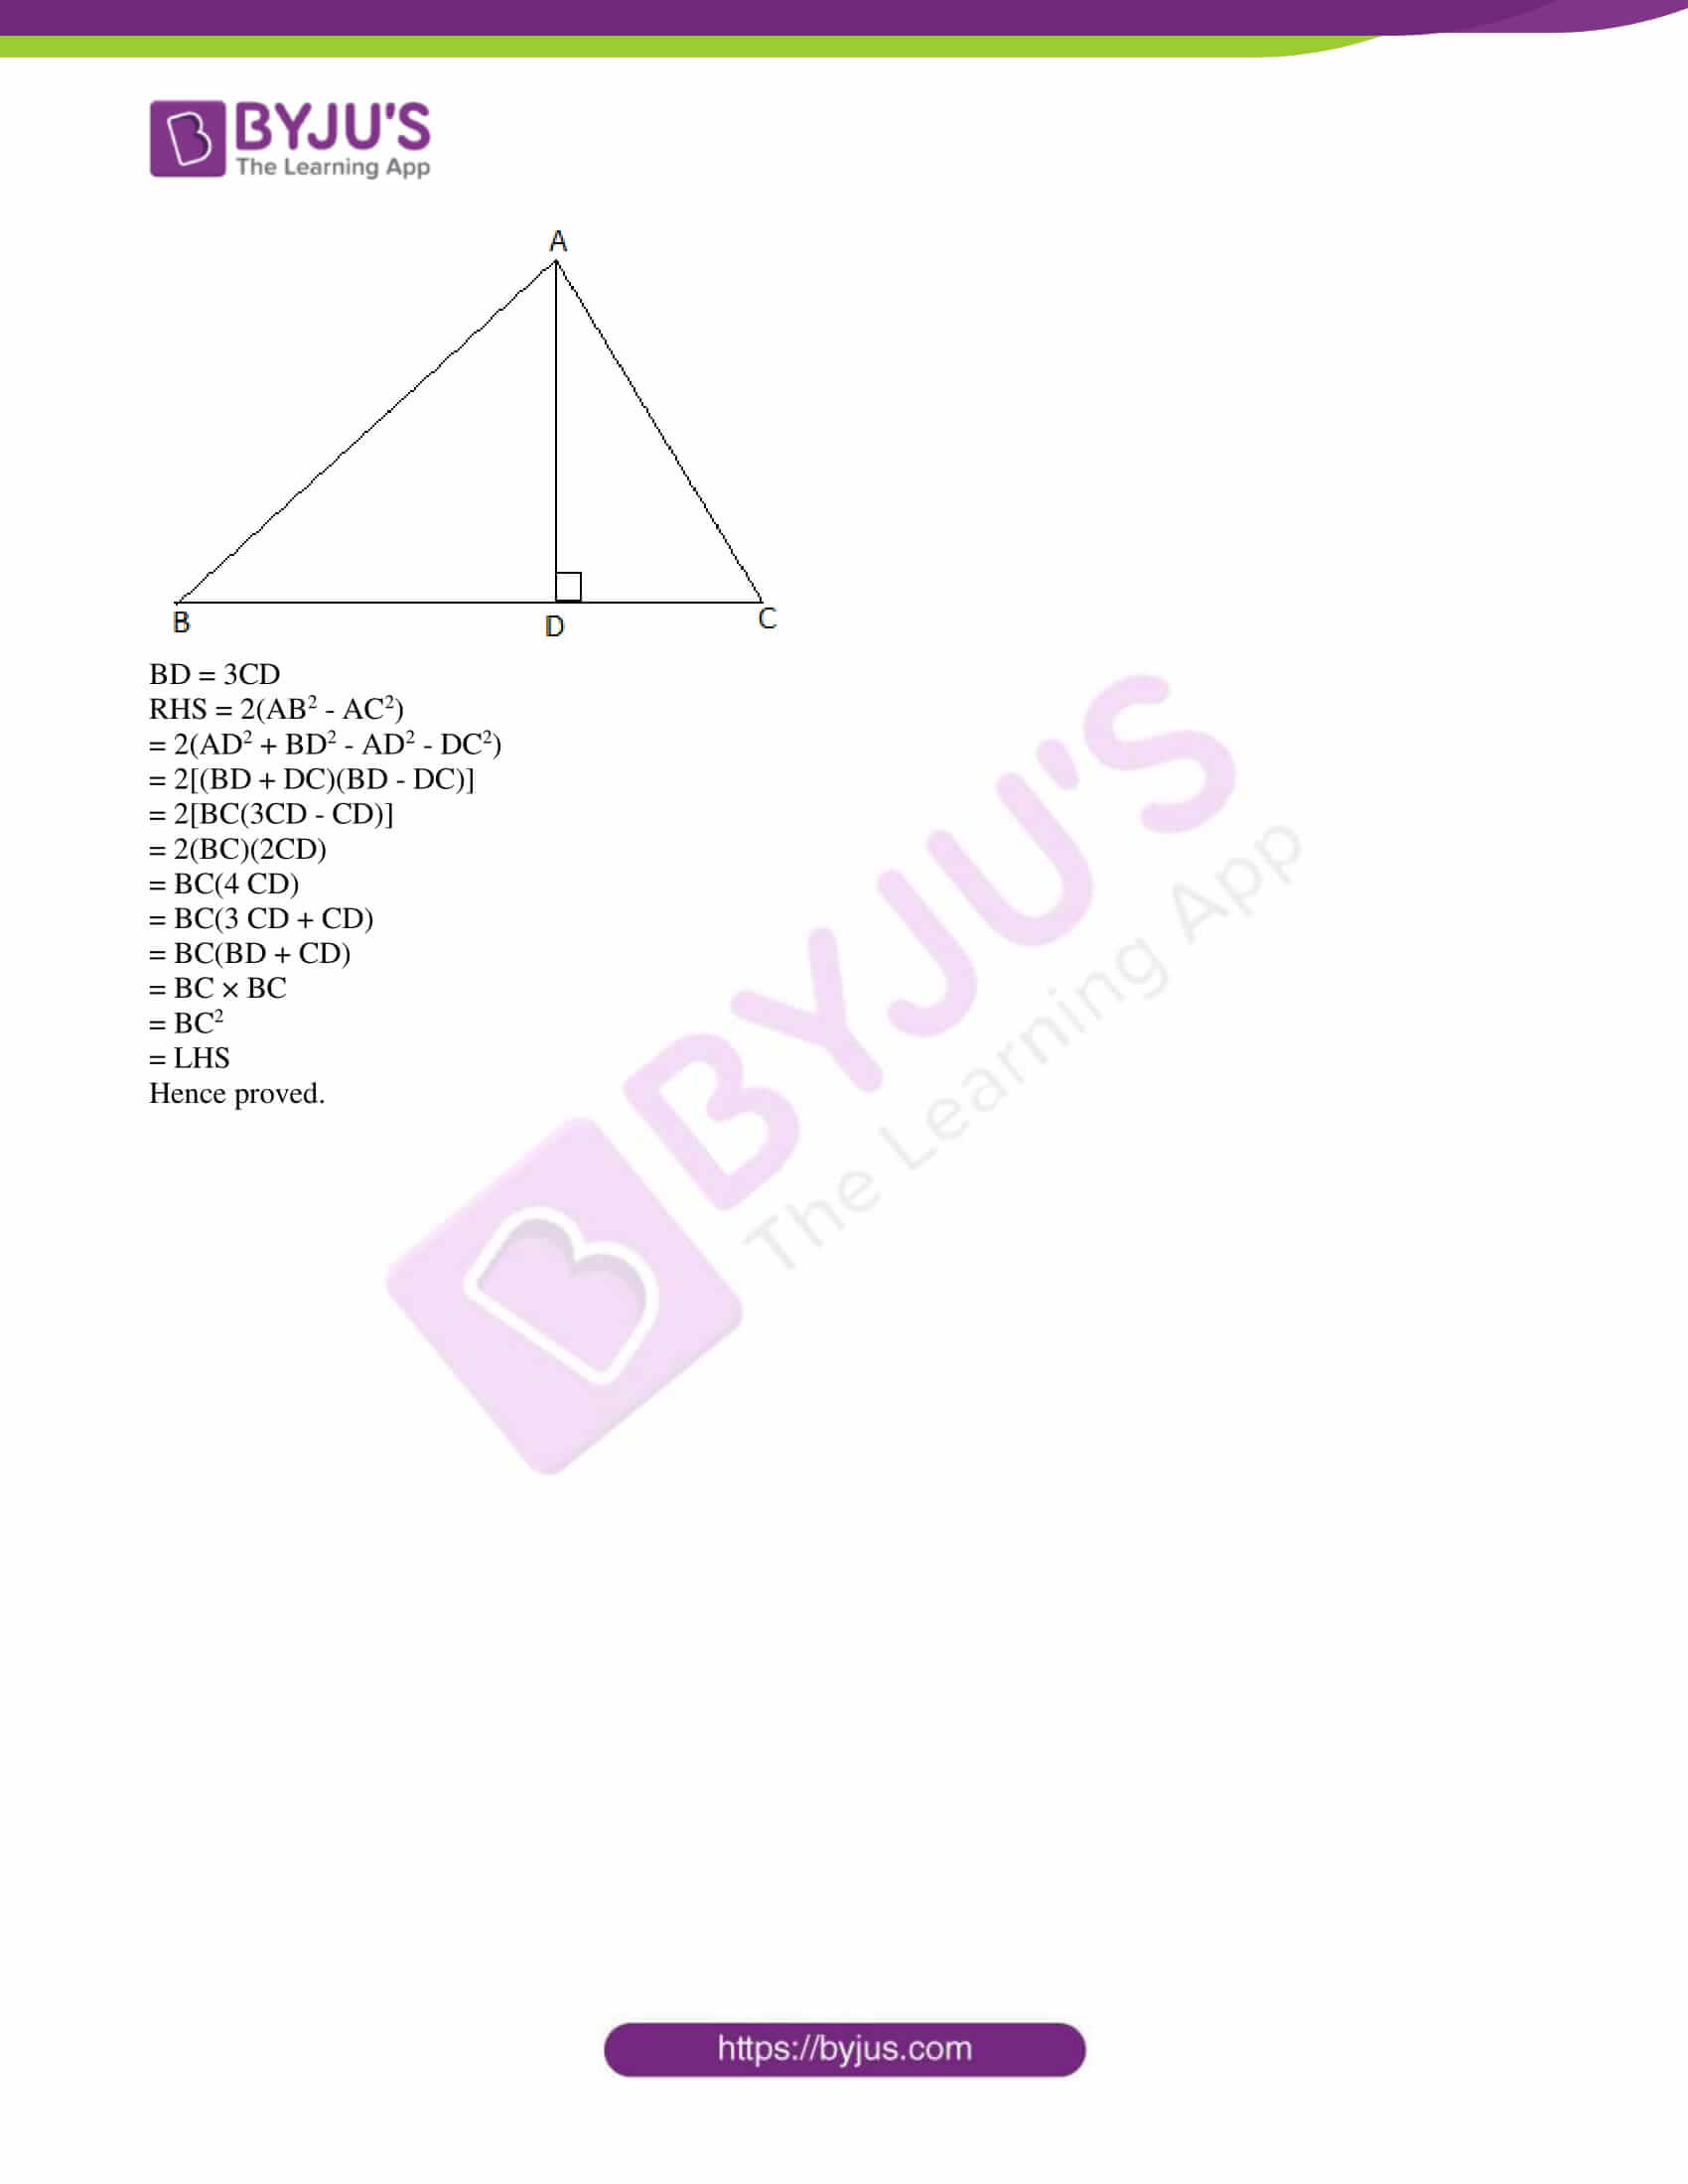 kseeb class 10 maths question paper solution 2018 23